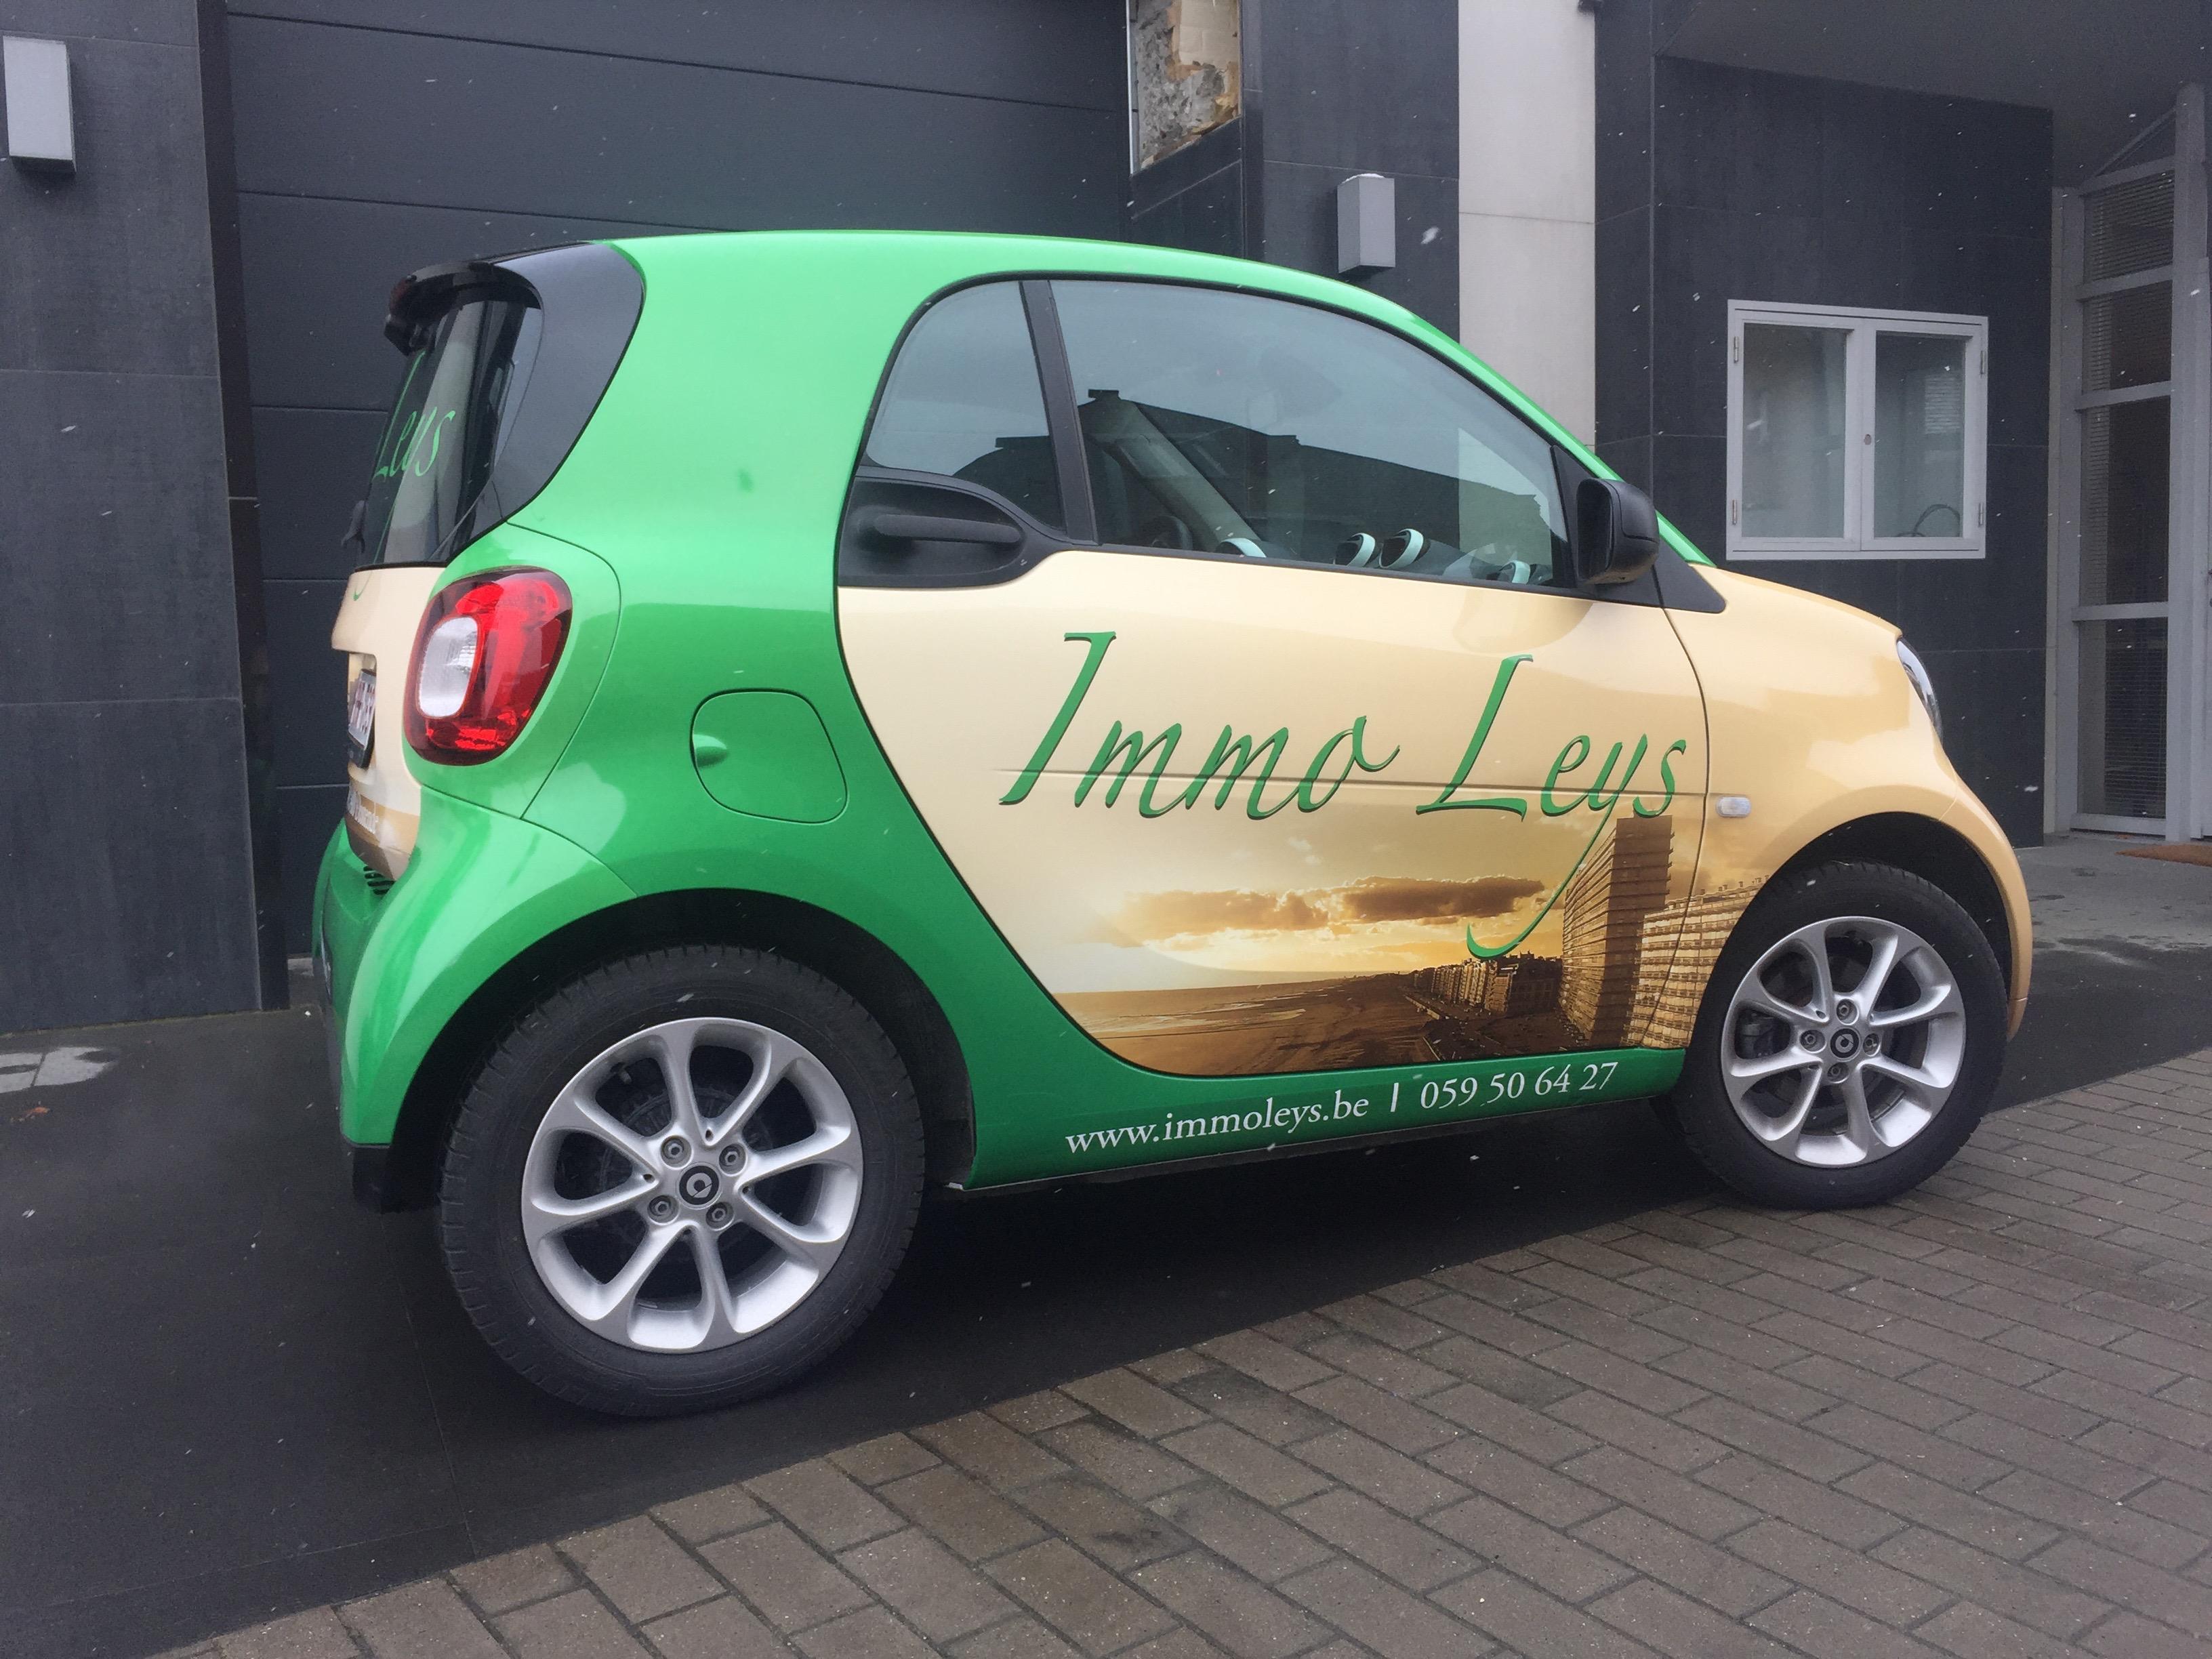 Carwrap - Smart Immo leys 1